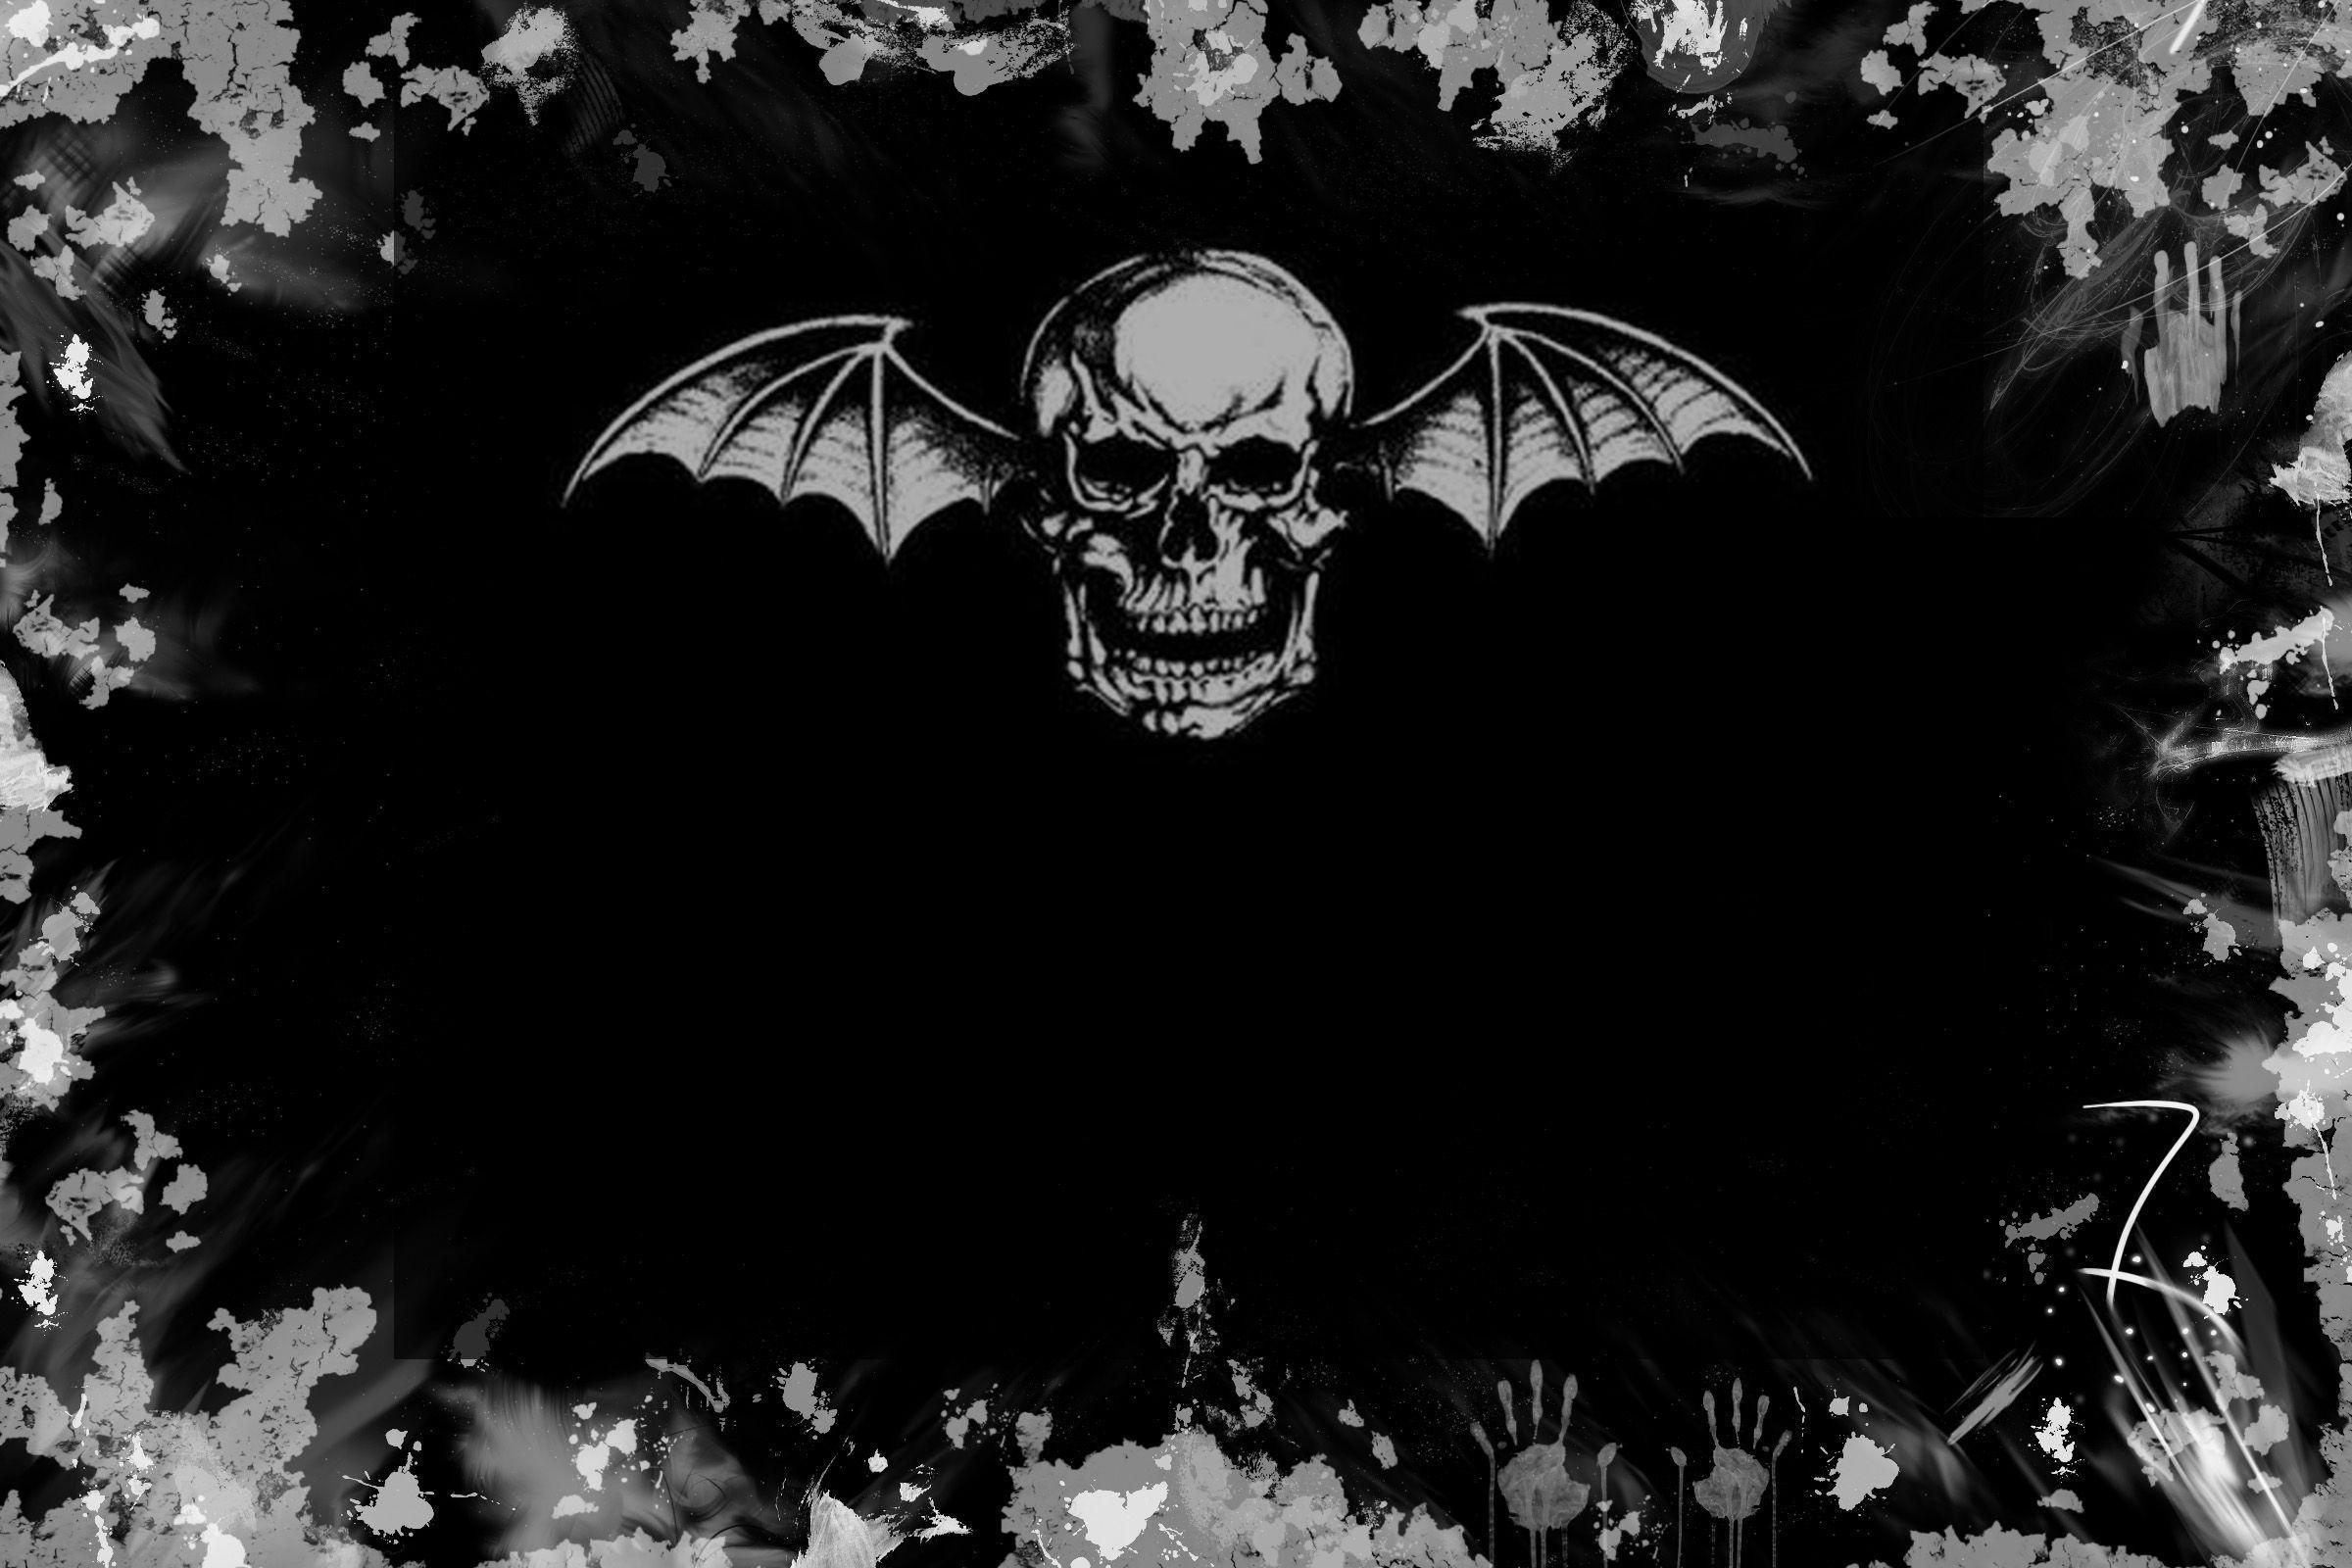 Avenged Sevenfold Hd Wide Wallpaper #26670 Wallpaper | Risewall.